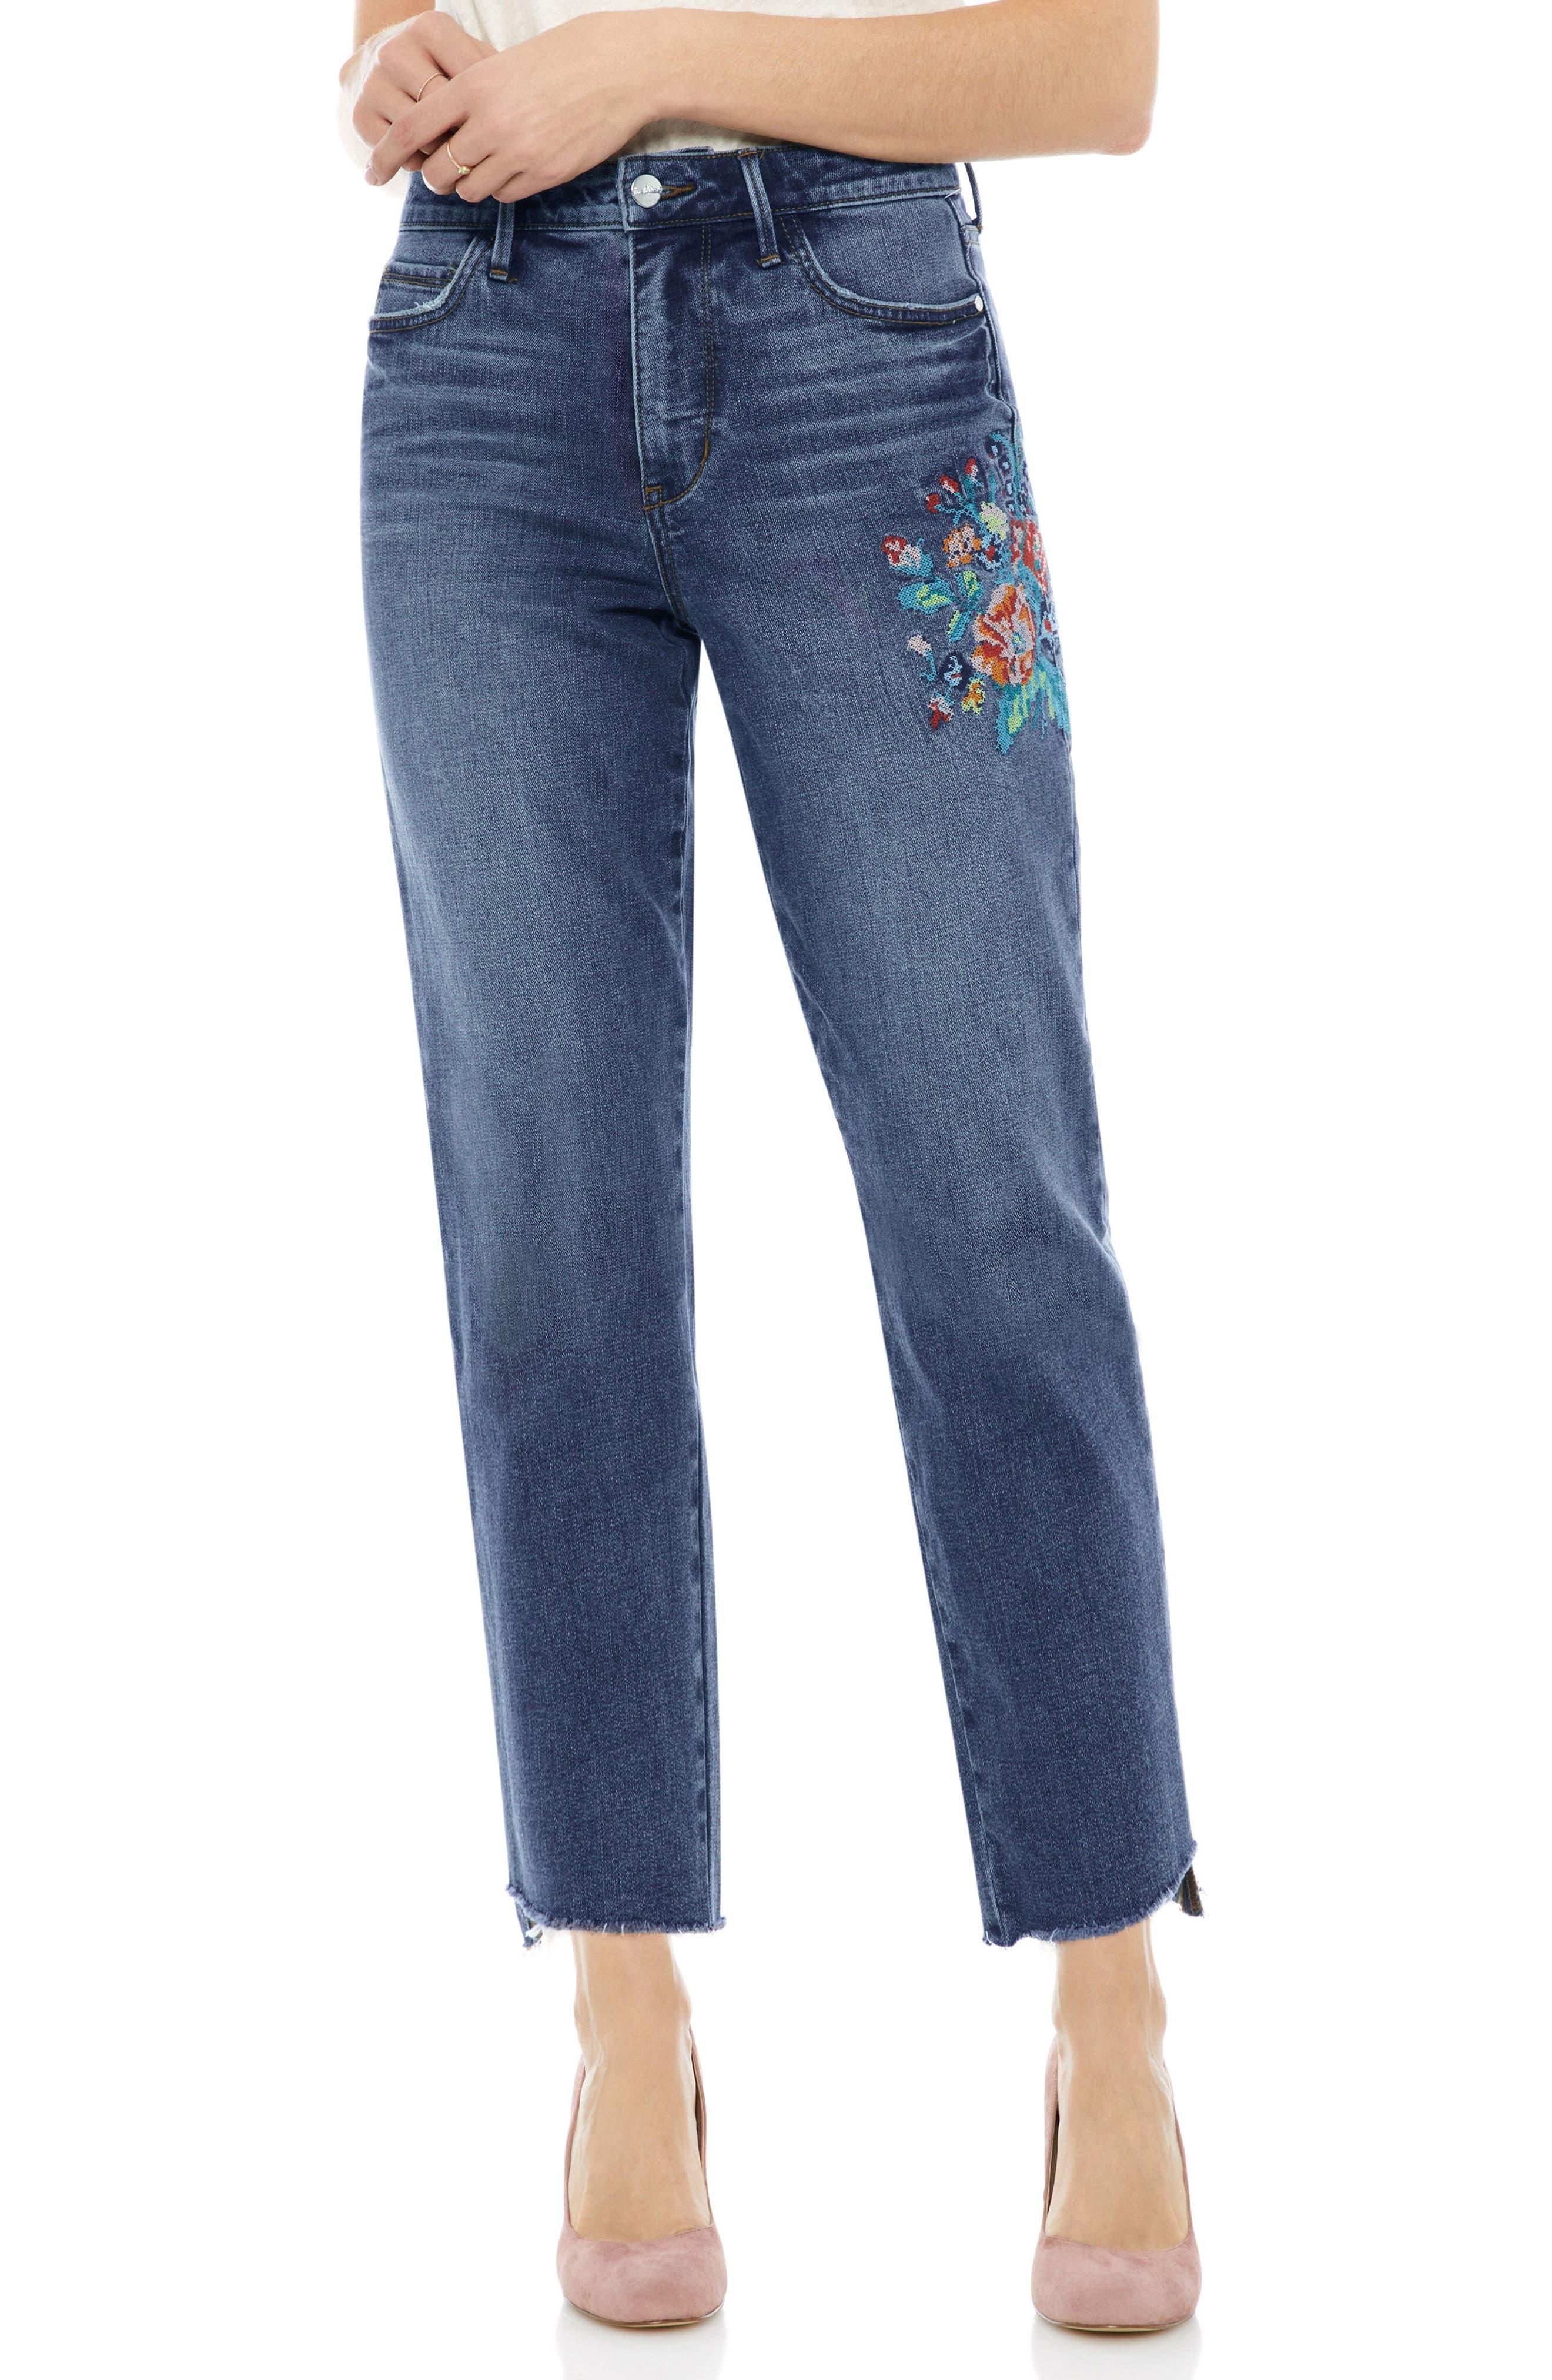 SAM EDELMAN The Mary Jane Floral Accent Step Hem Jeans, Main, color, 420